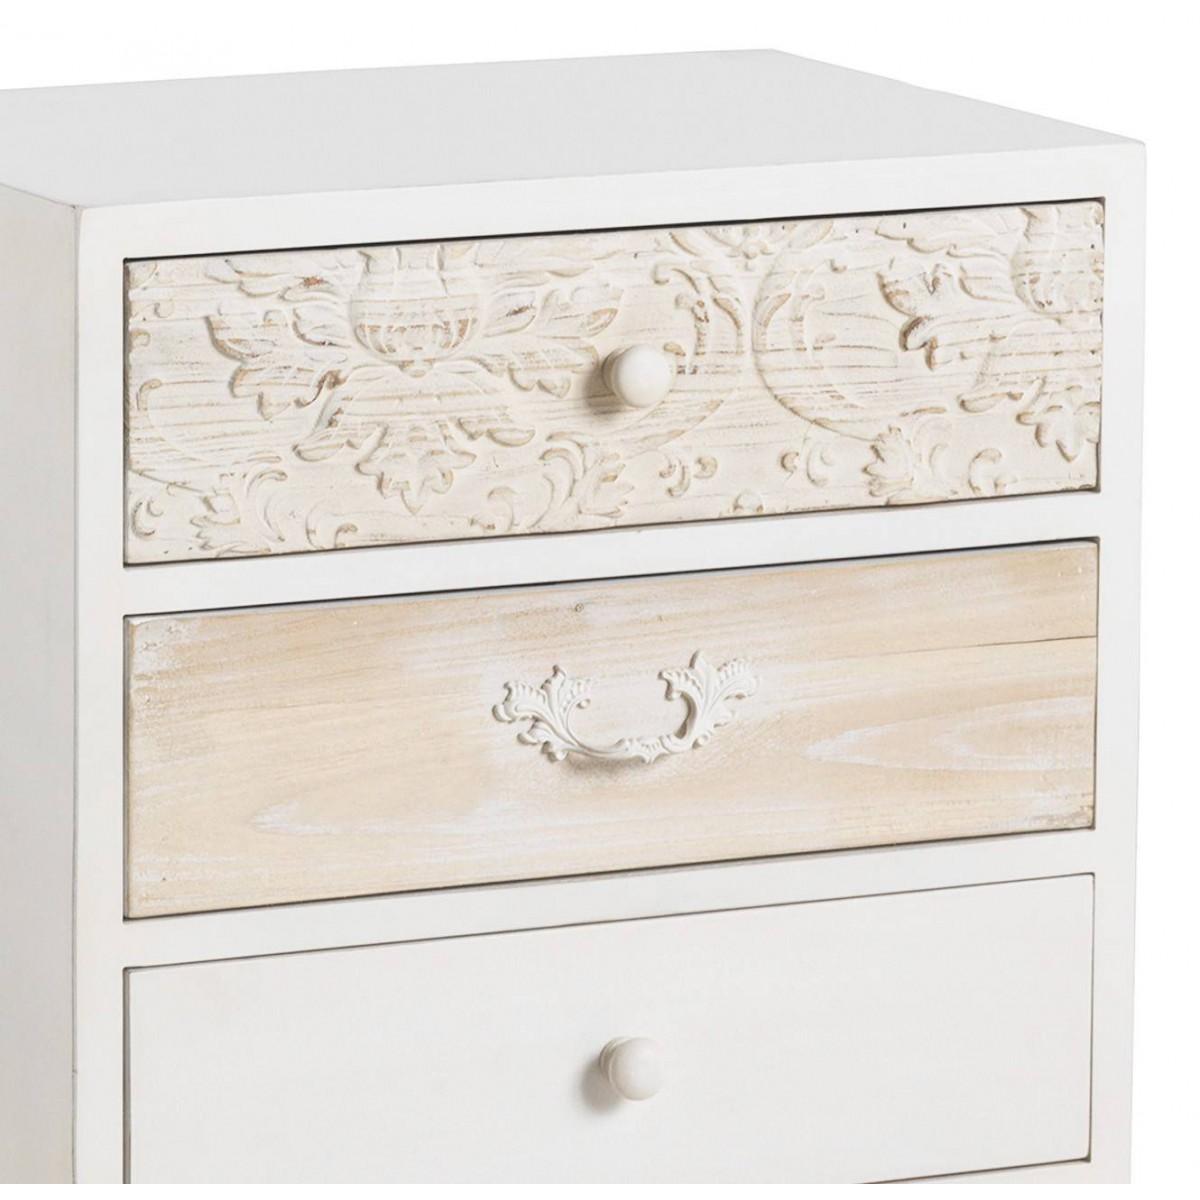 Mesita de noche mogens blanca madera tallada - Perchas de madera blancas ...